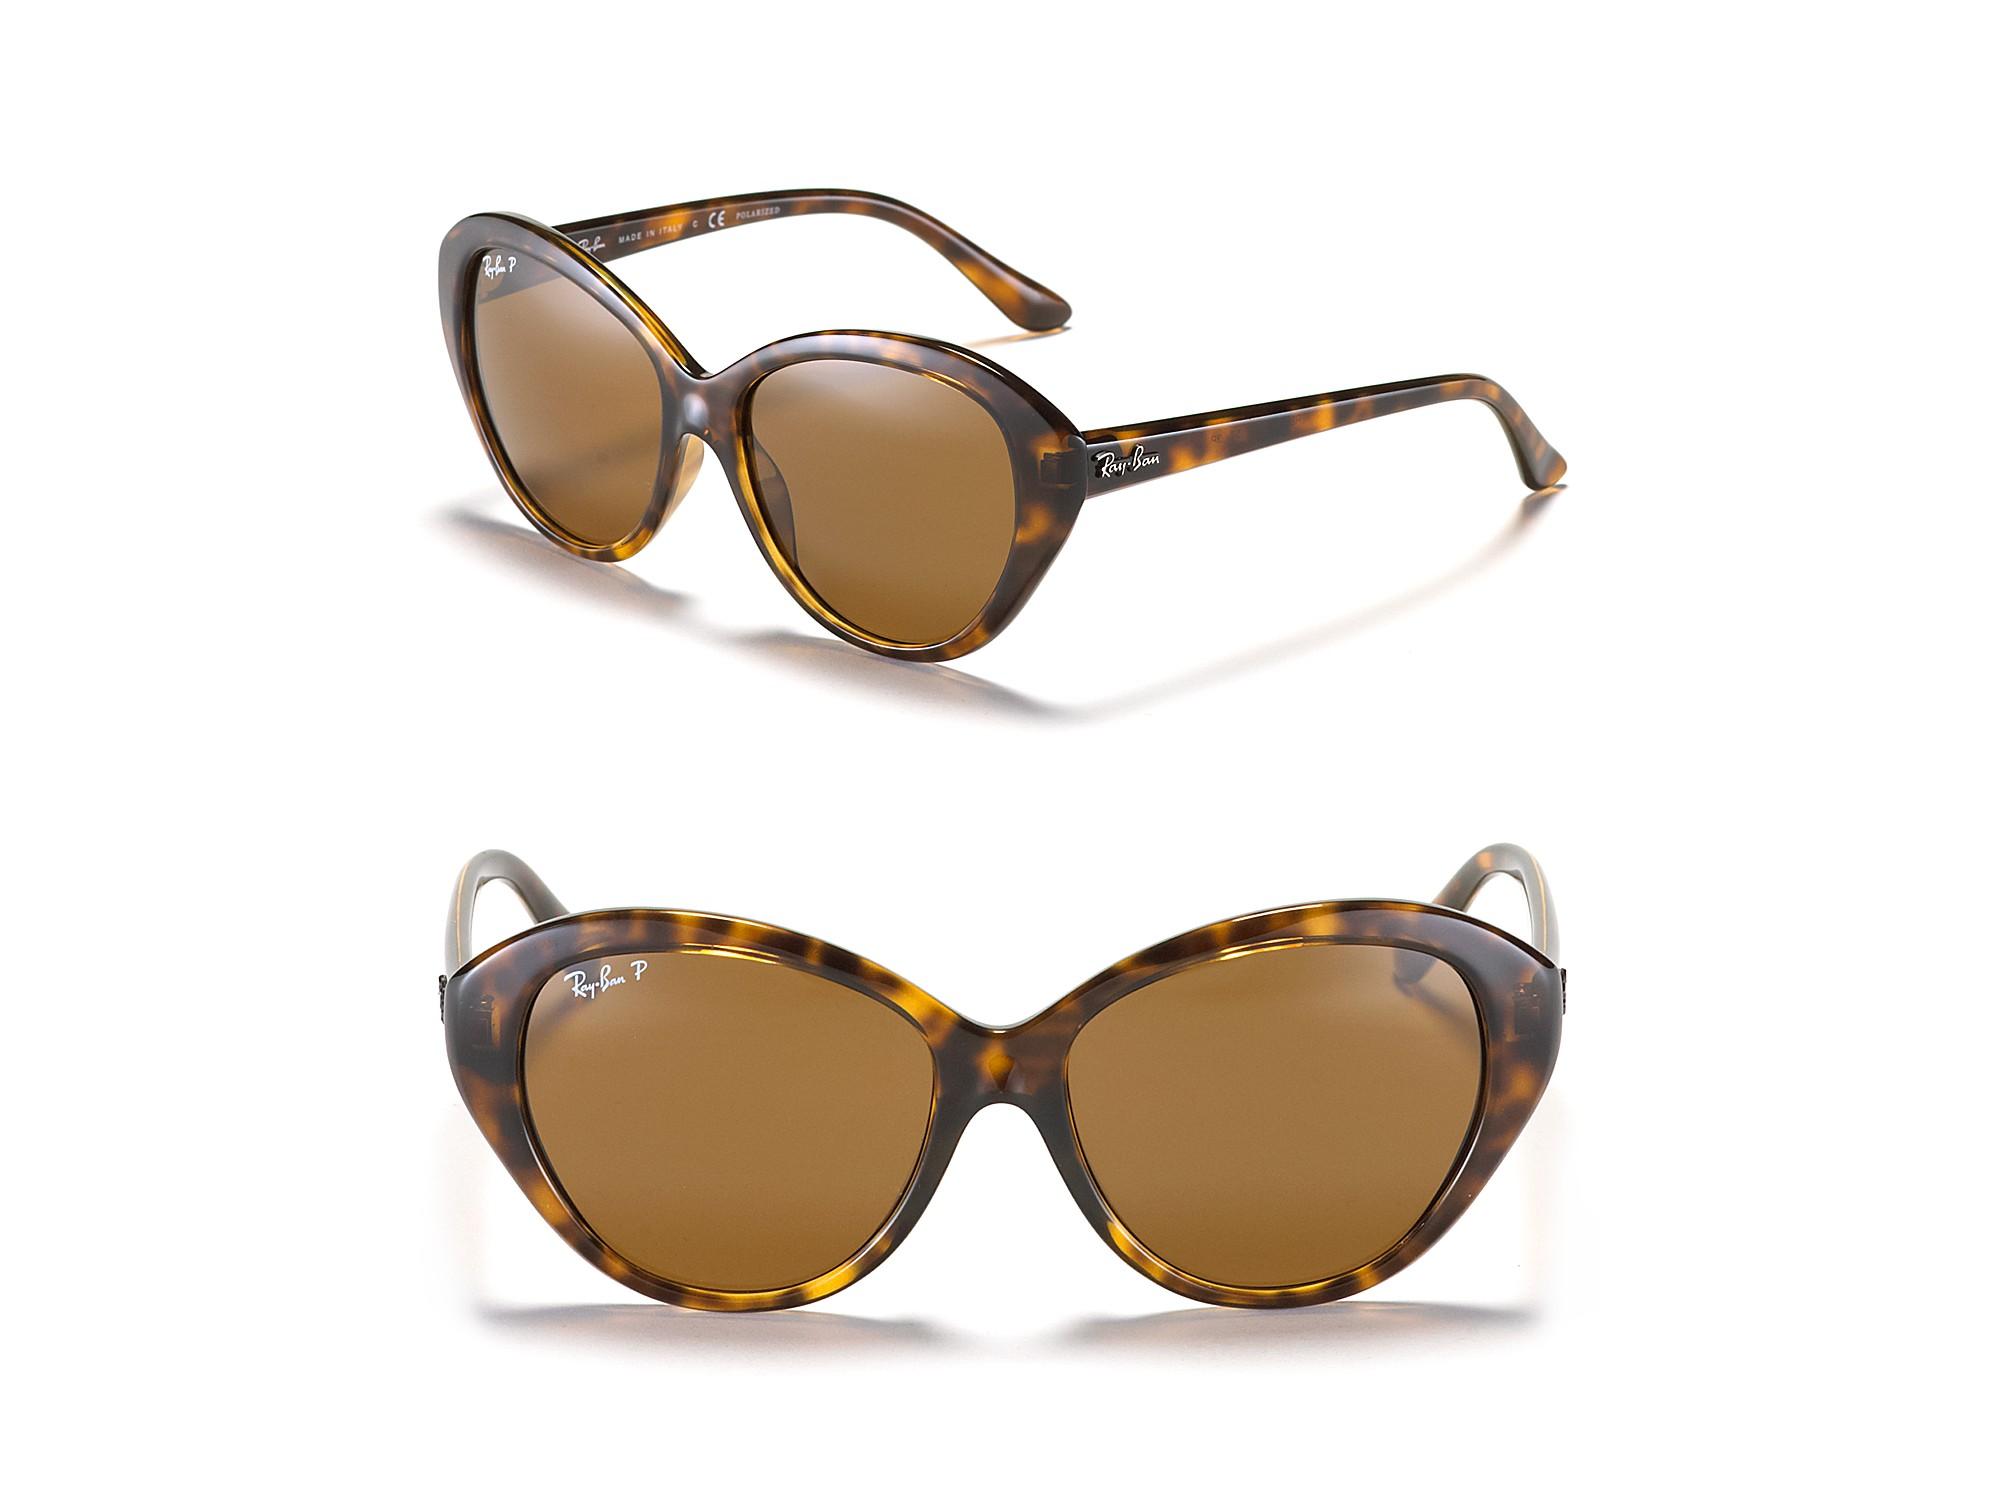 ray ban highsteet gradient cat eye sunglasses in brown. Black Bedroom Furniture Sets. Home Design Ideas